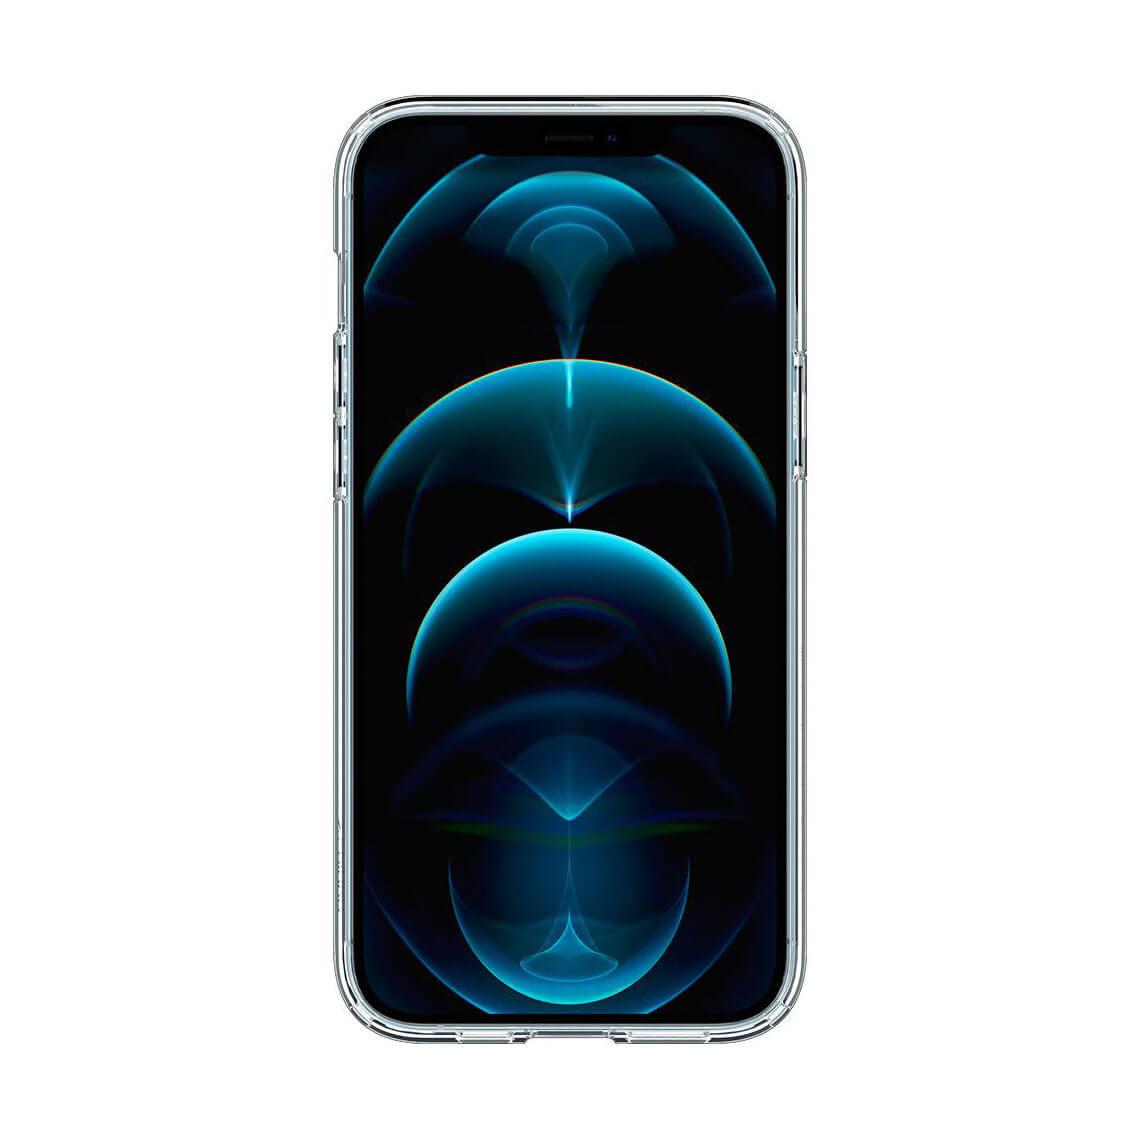 کاور اسپیگن Ultra Hybrid آیفون 12 Pro Max